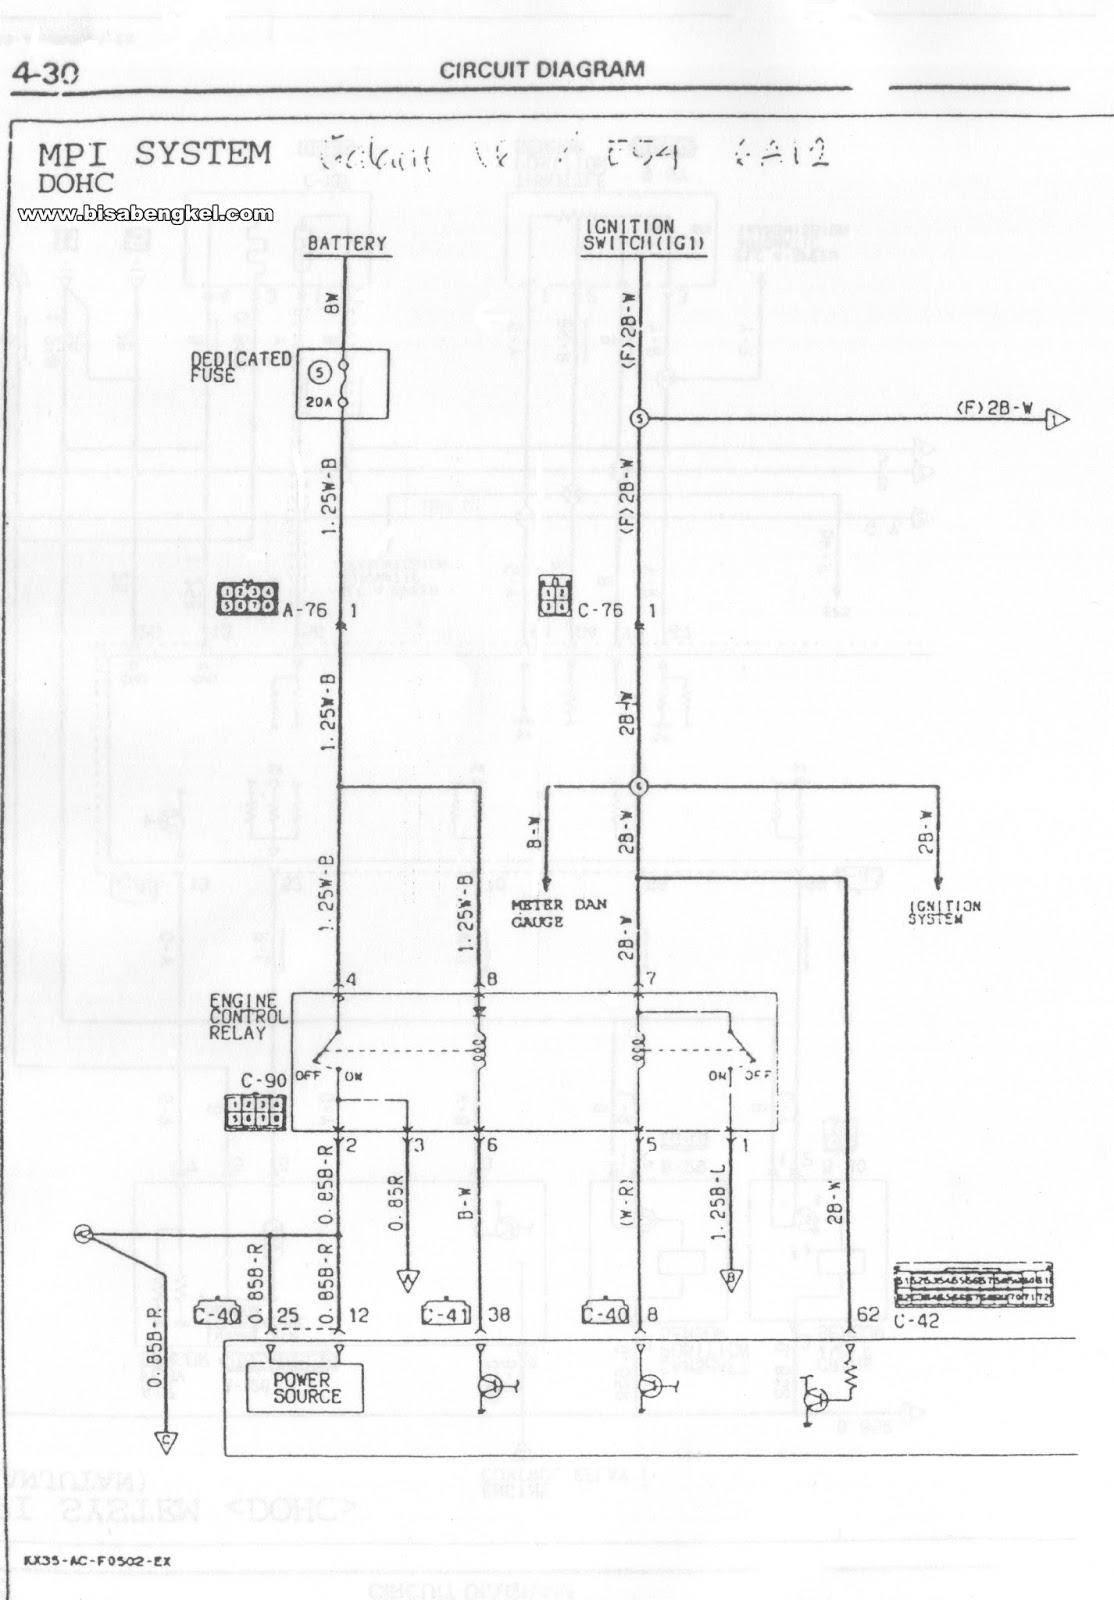 wiring diagram kelistrikan ac mobil free download wiring diagram rh xwiaw us 1999 Mitsubishi Galant Wiring-Diagram 95 Mitsubishi Galant Wiring-Diagram